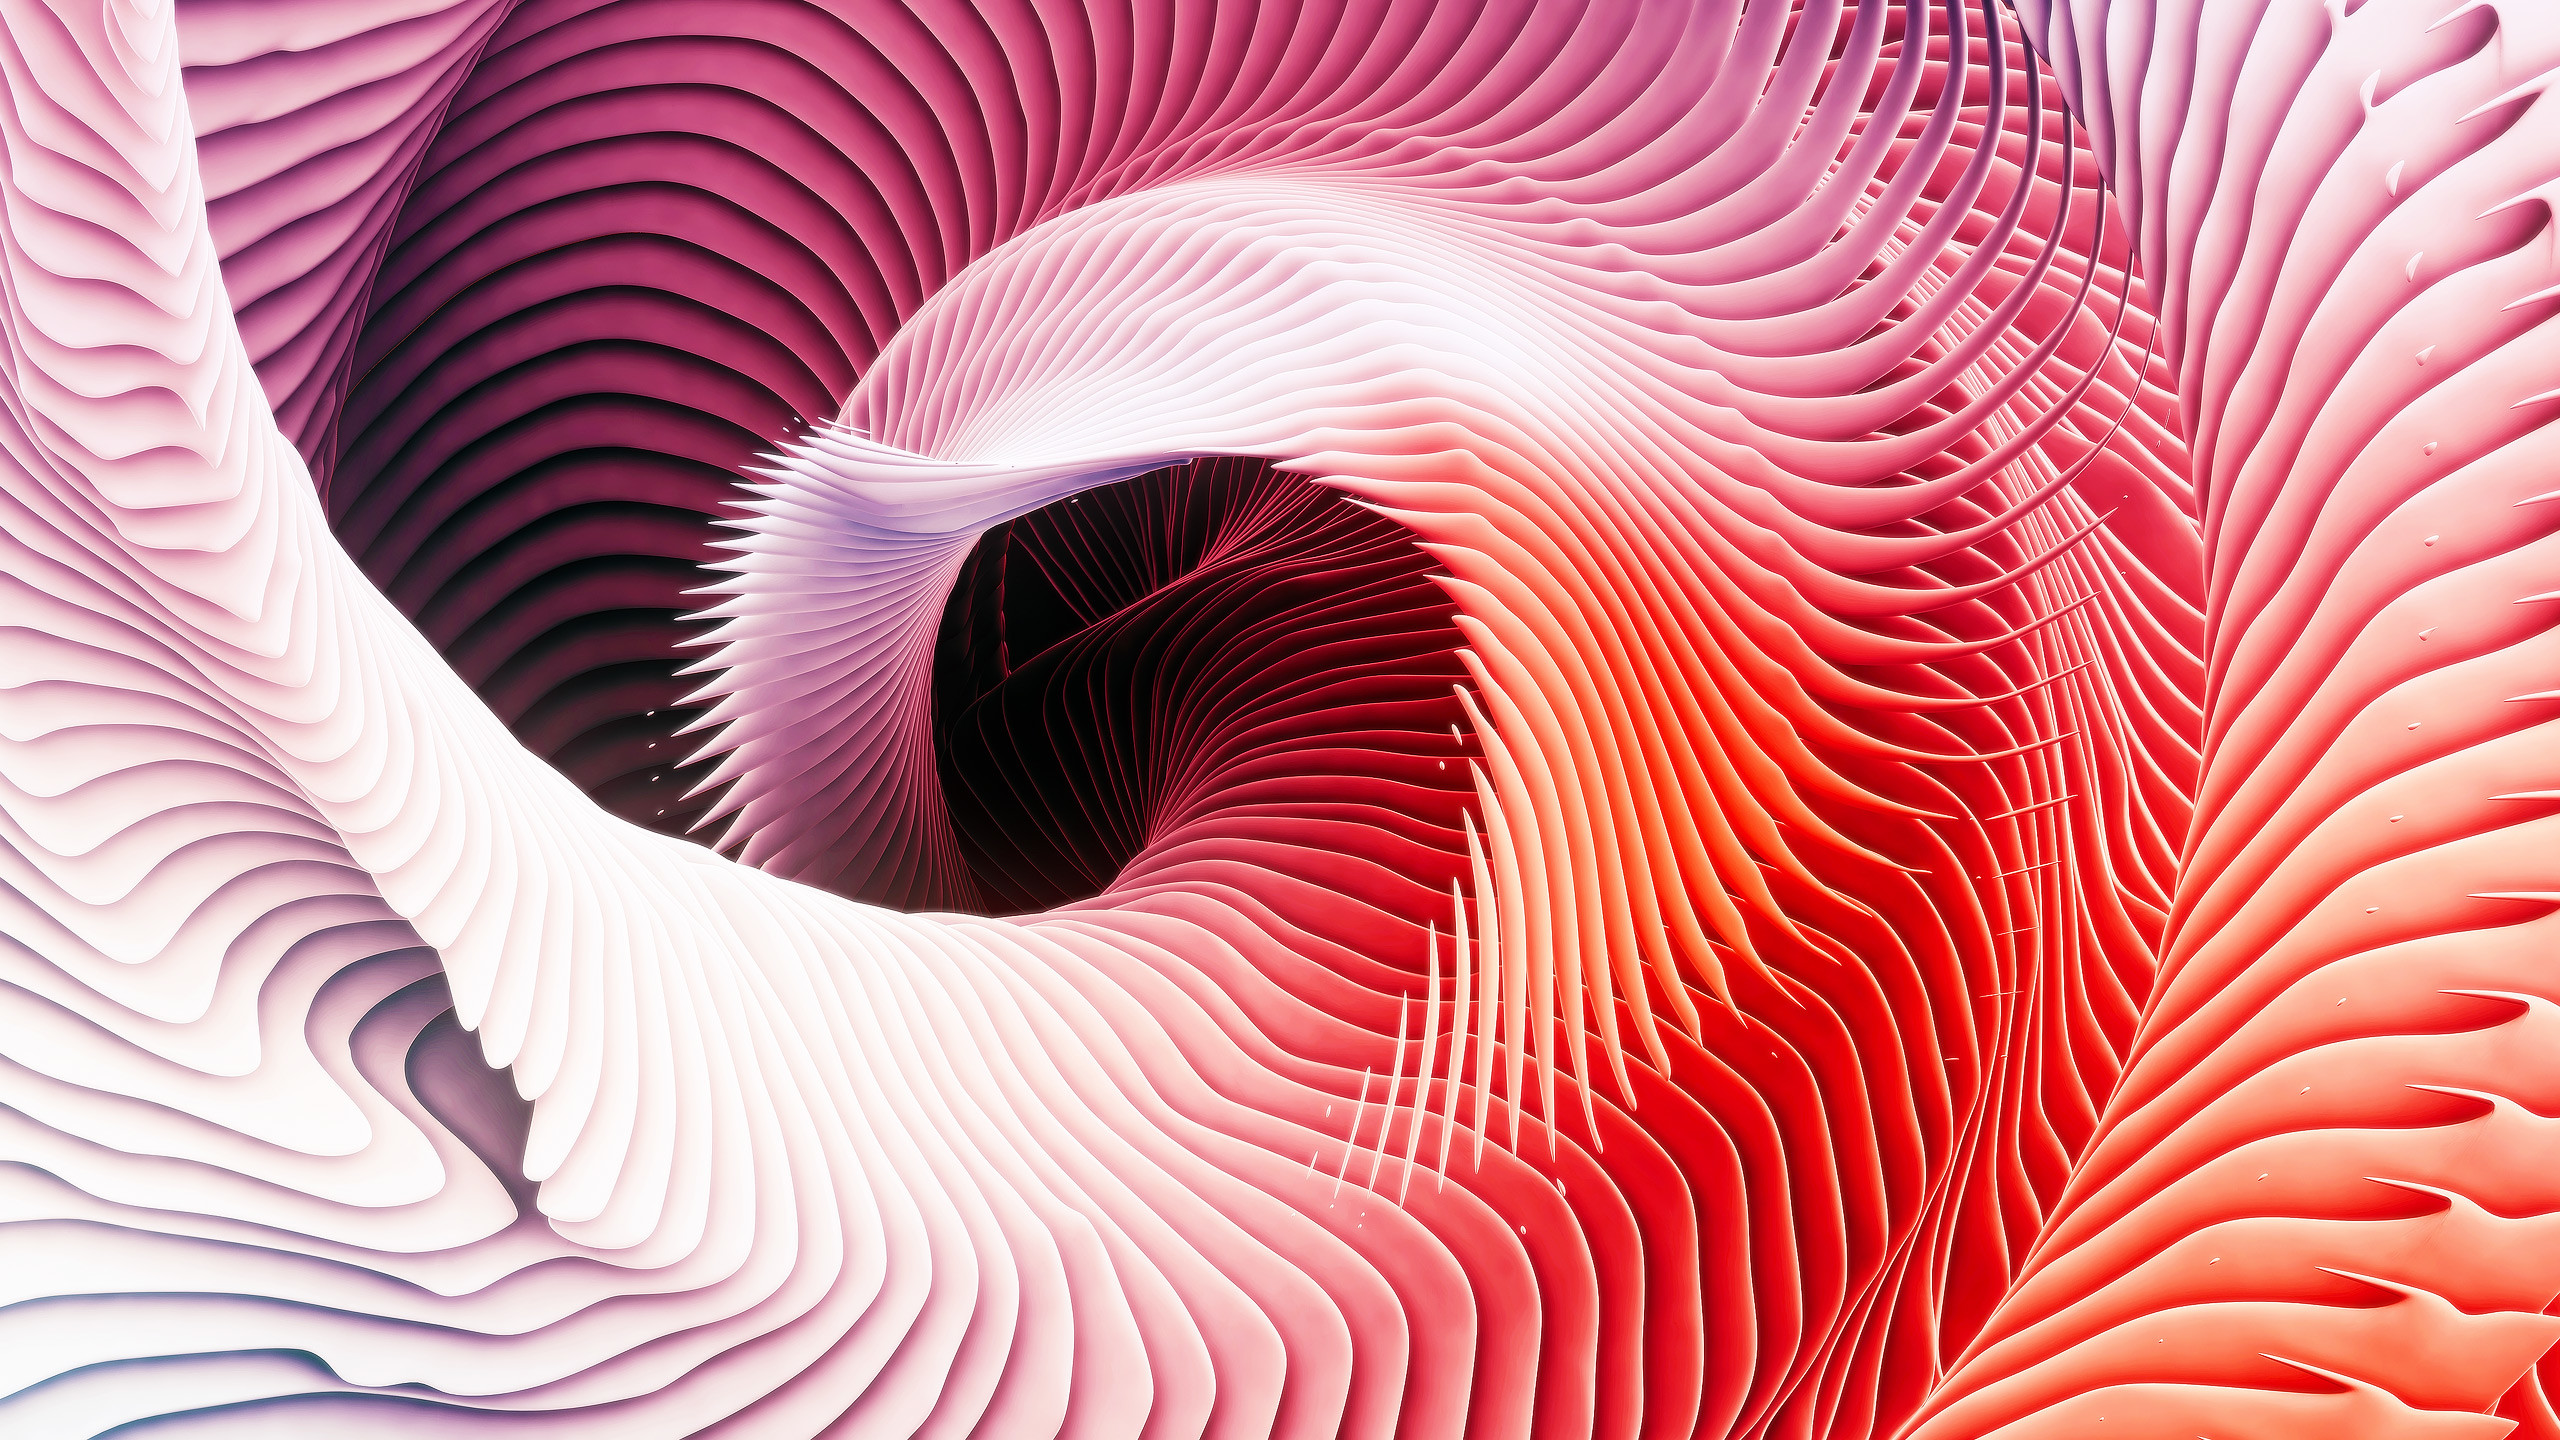 MacBook Pro Event Wallpaper ari weinkle Spiral_3B. Download via  @airweinkle: desktop (2560 …